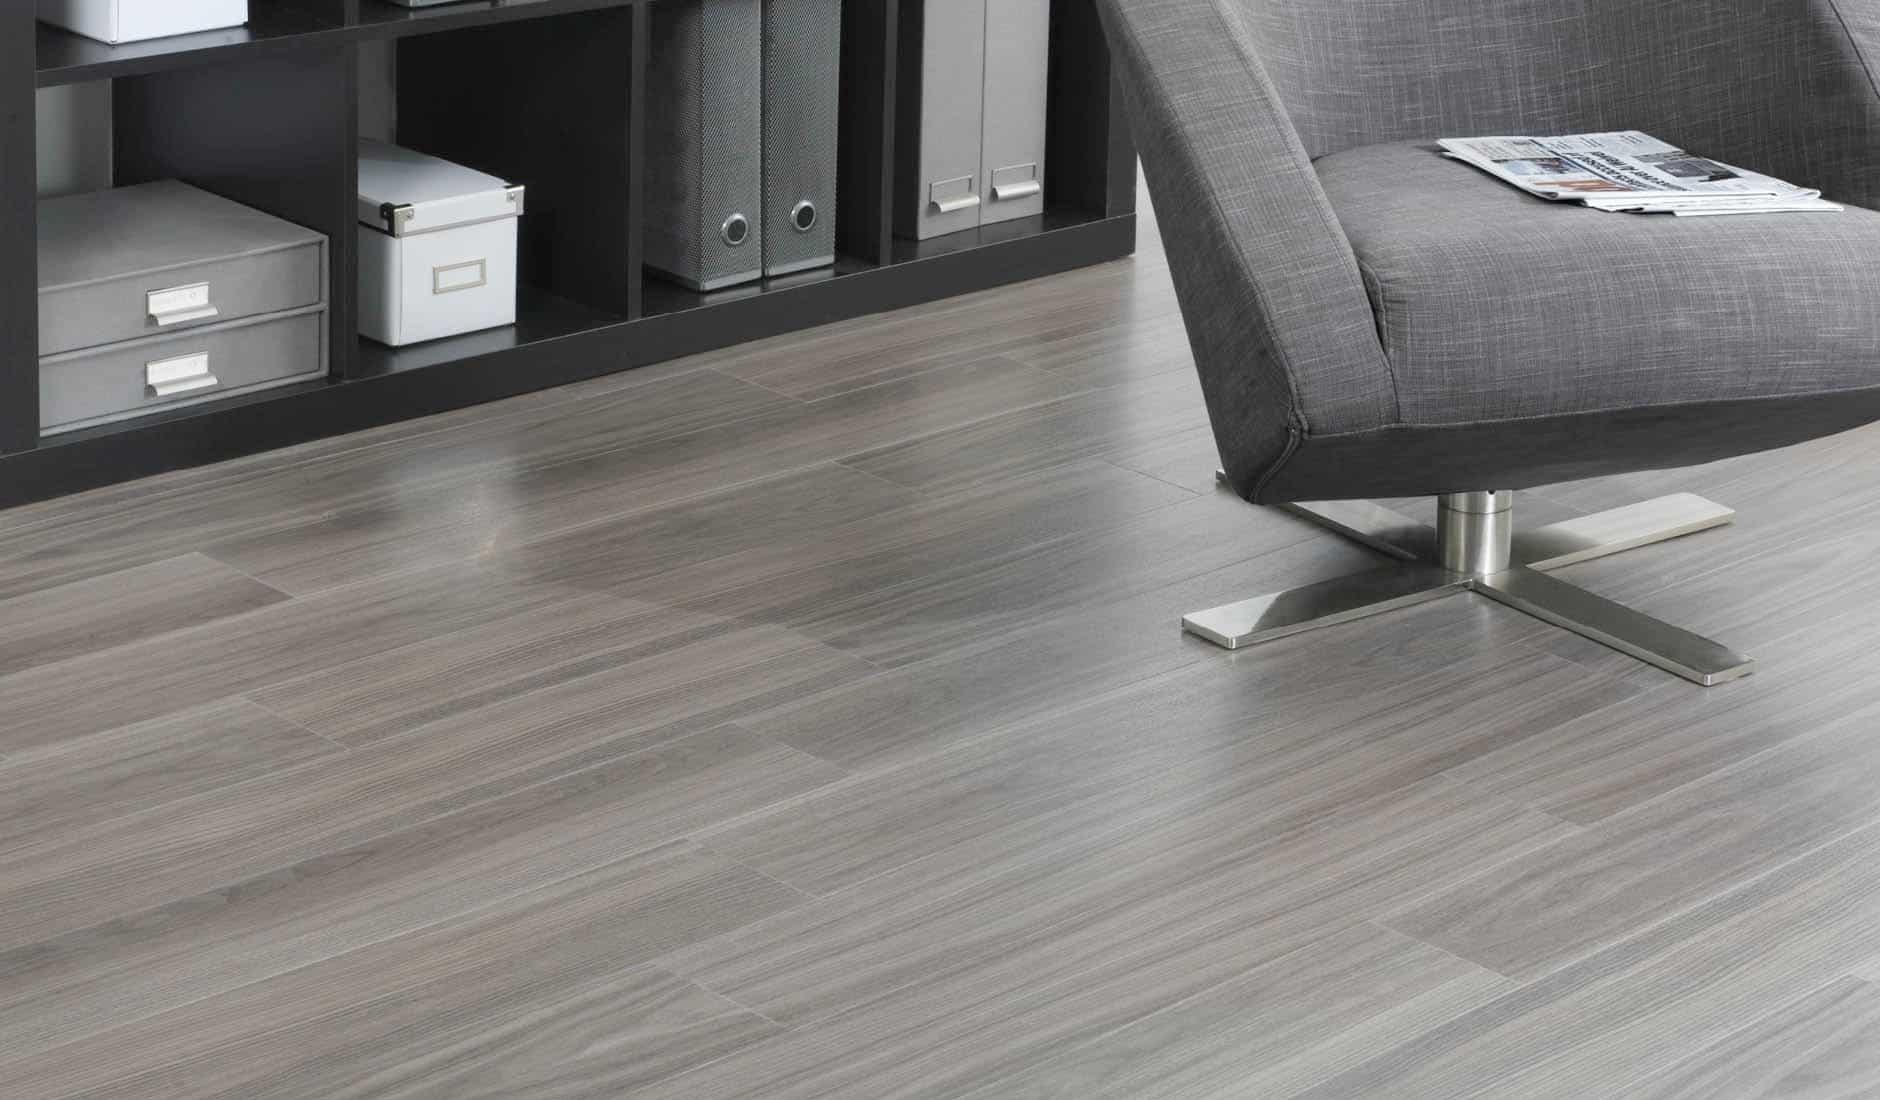 Carpet Tiles Vs Laminate Flooring In Office Singapore